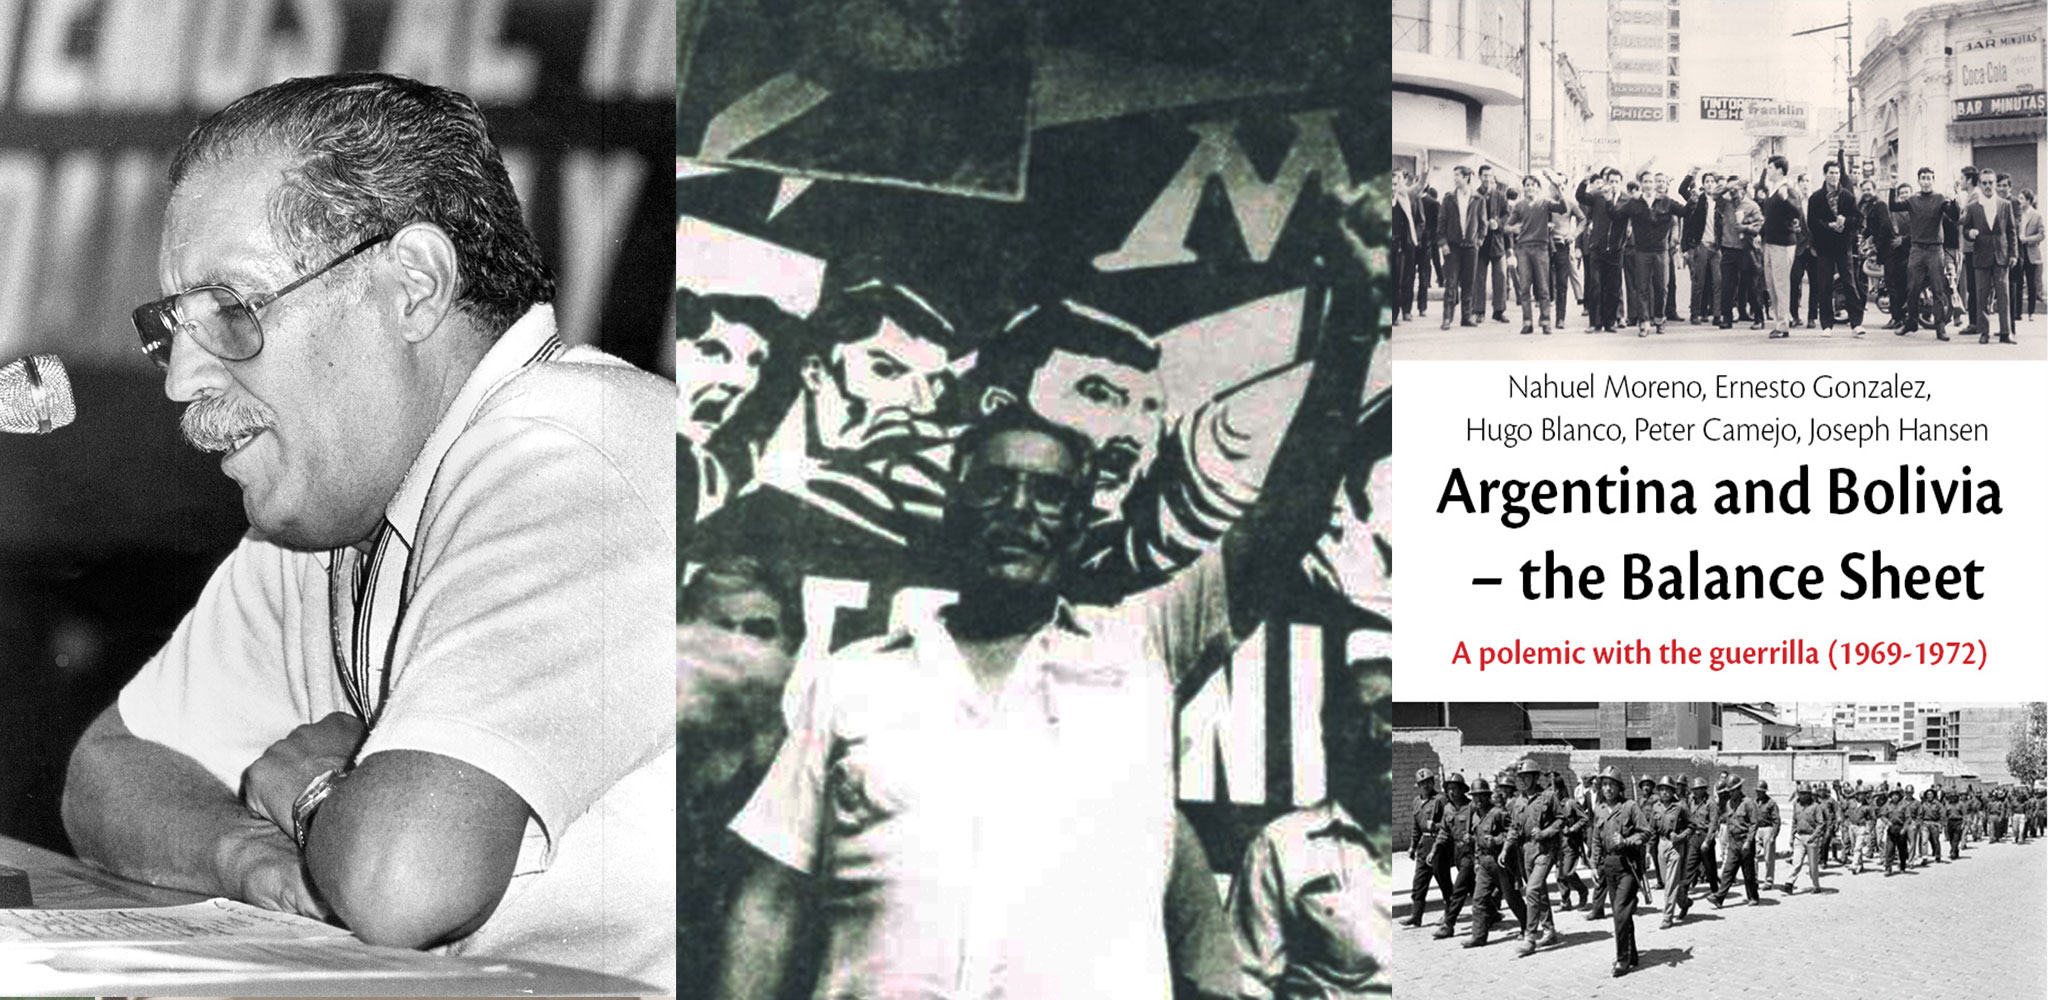 ARGENTINA AND BOLIVIA, THE BALANCE SHEET (1973)